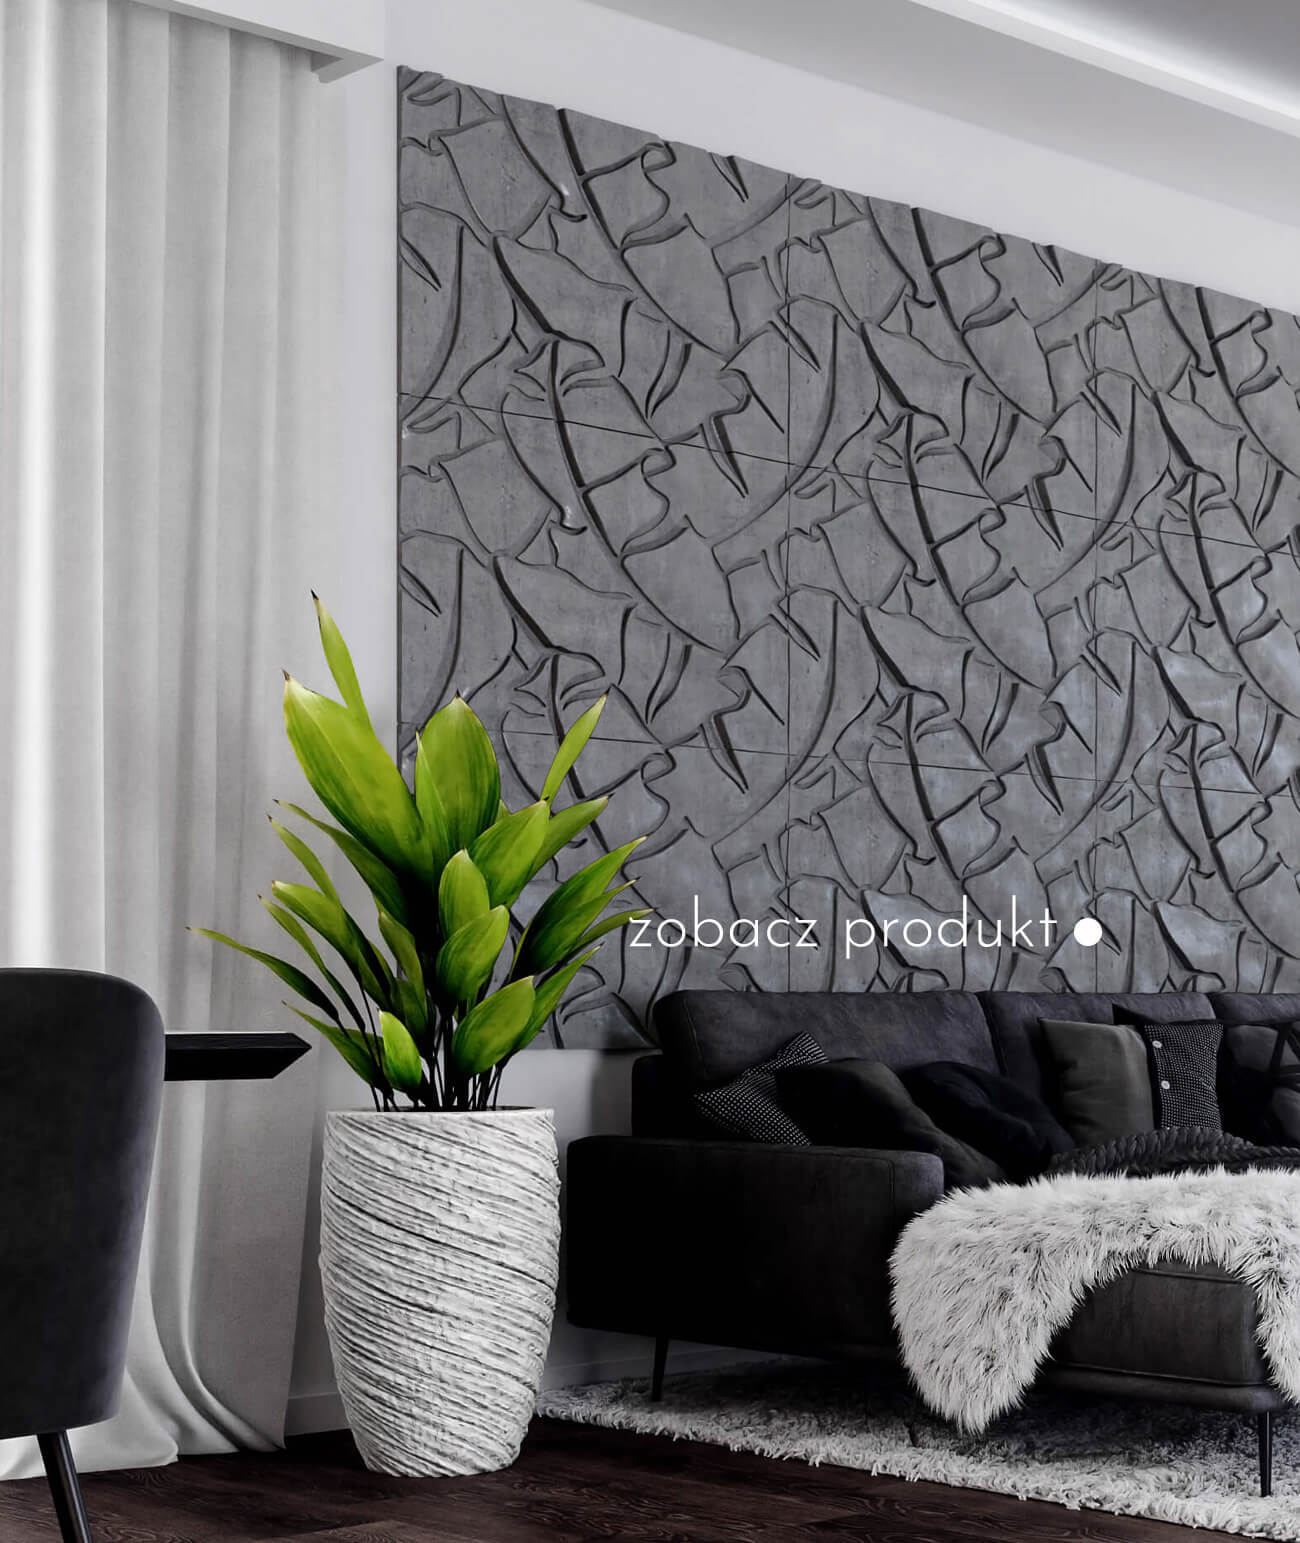 panele-betonowe-3d-scienne-i-elewacyjne-beton-architektoniczny_378-2093-pb34-b8-antracyt-botanical---panel-dekor-3d-beton-architektoniczny-panel-scienny